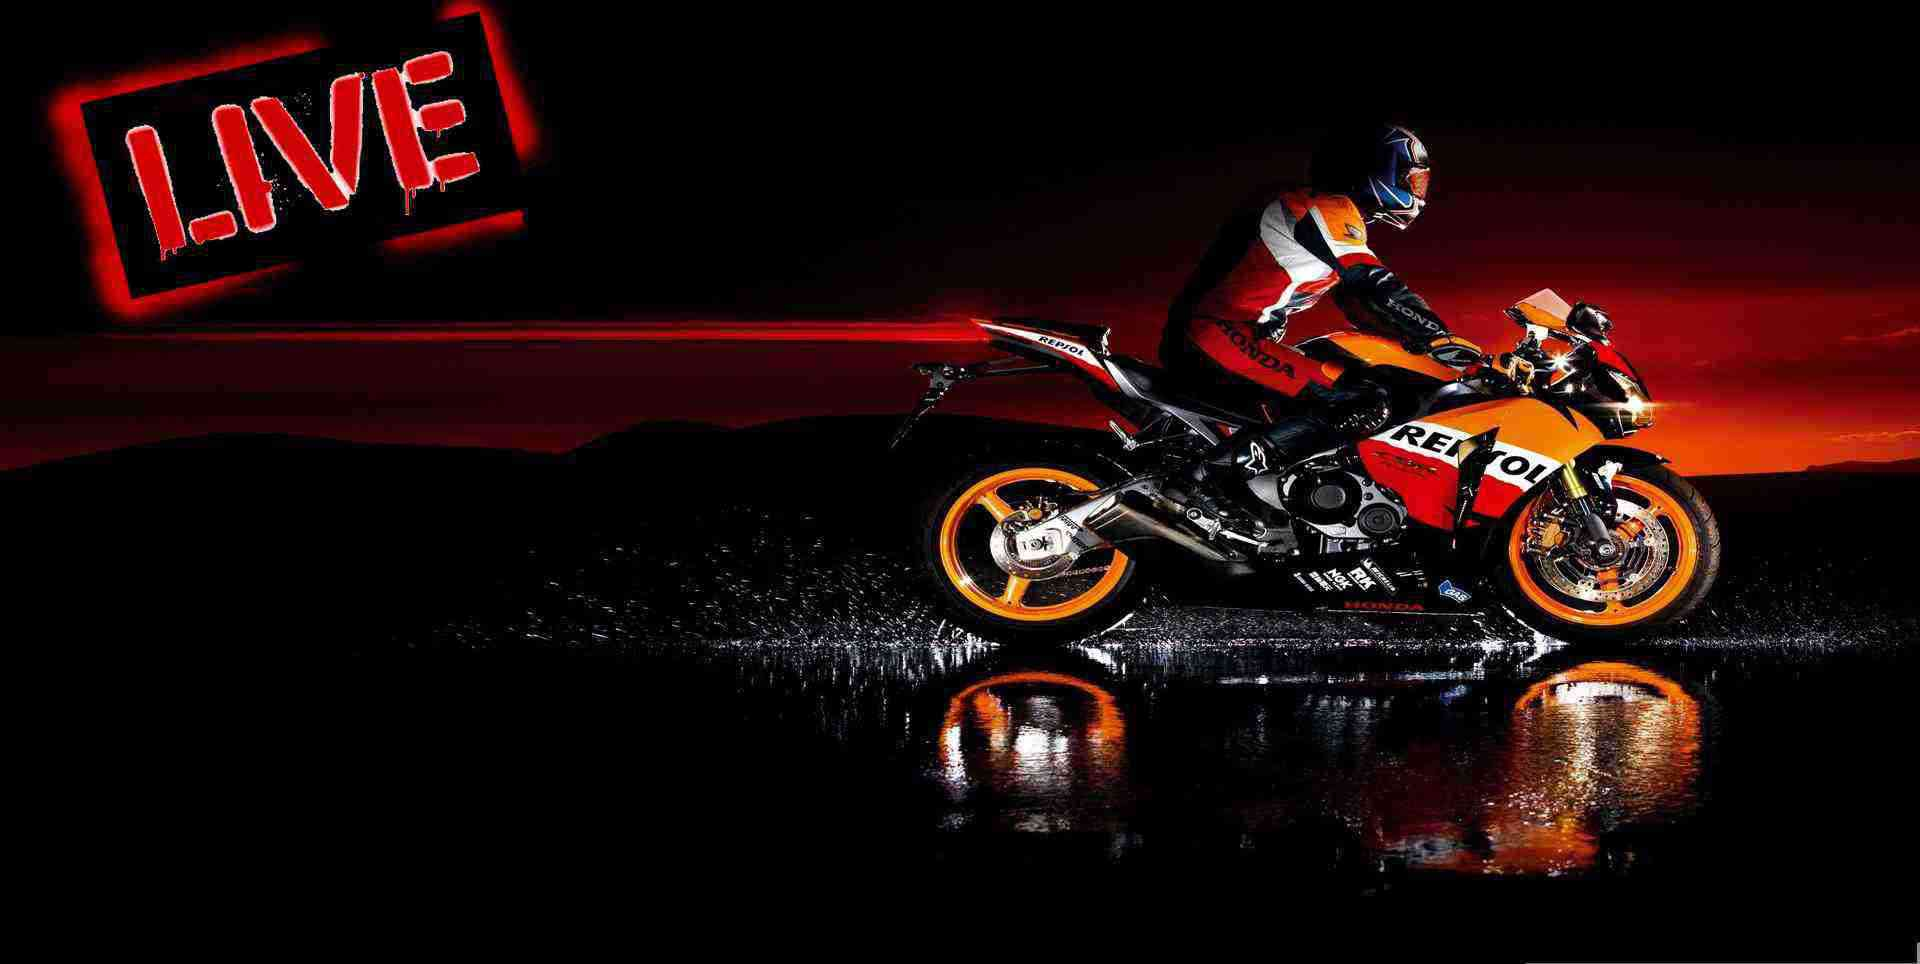 live-nerogiardini-motorcycle-grand-prix-of-austria-online